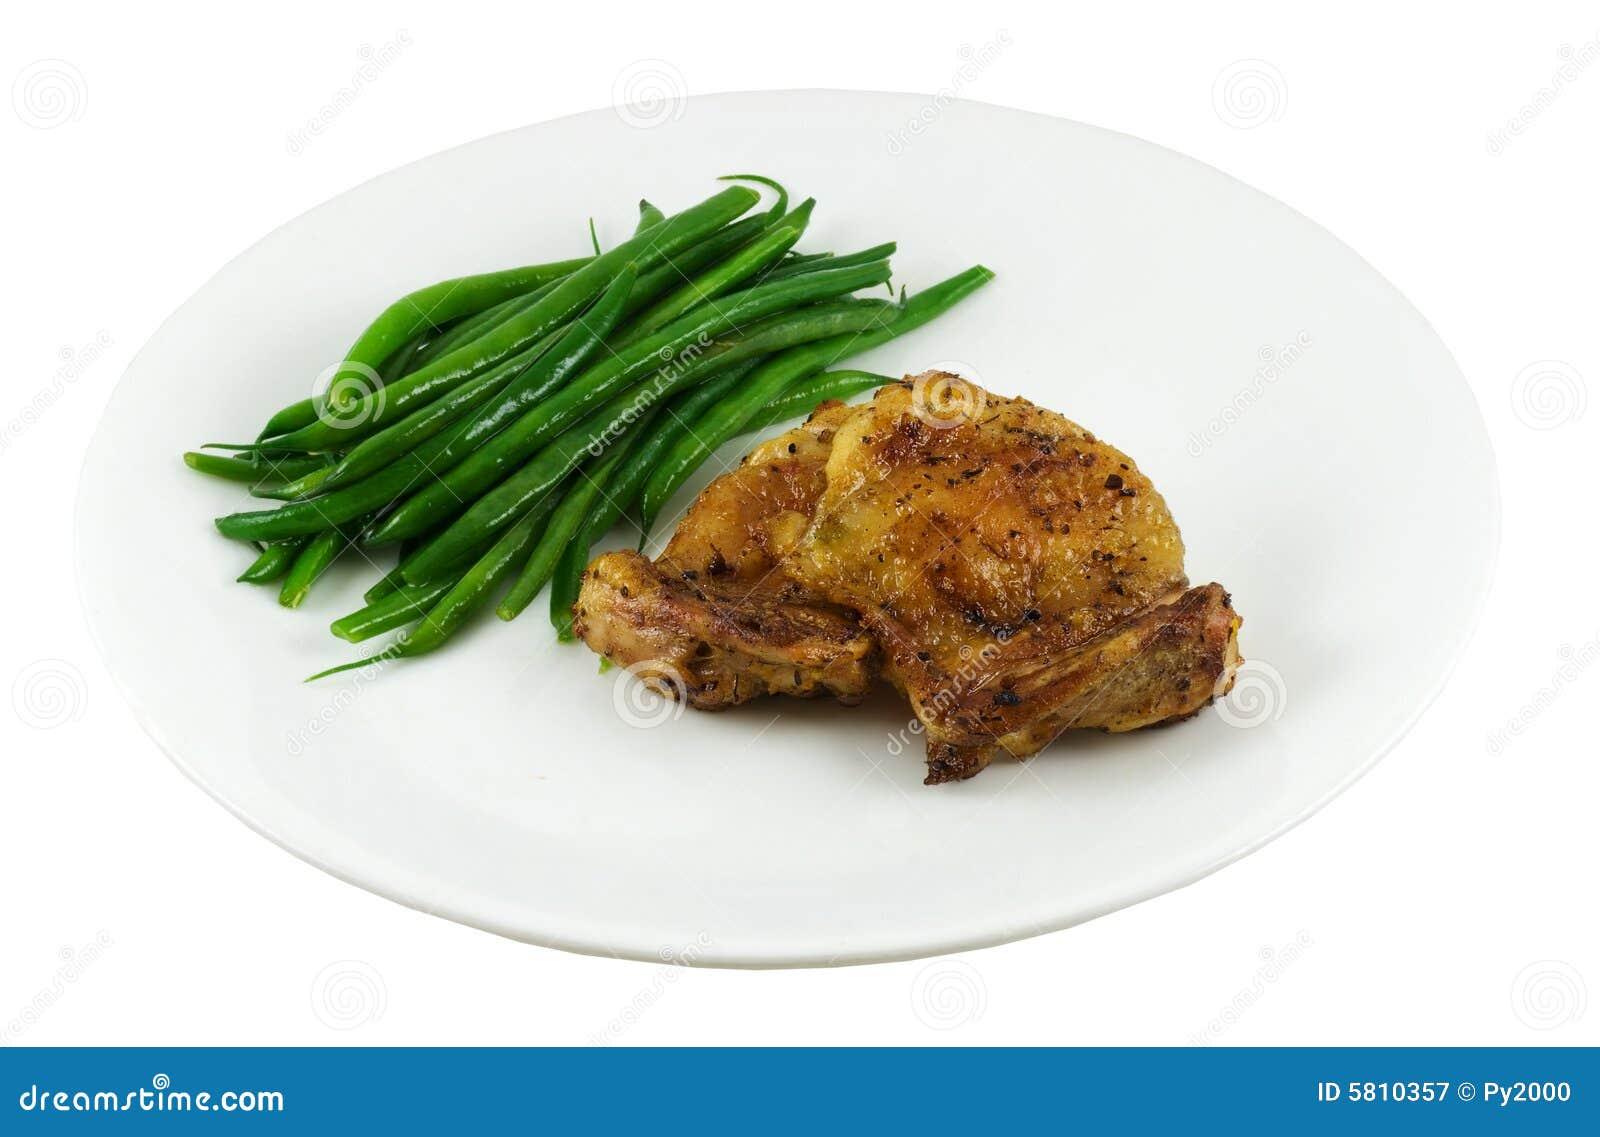 鬼灵粹�*�i)�ad�n��aczg_烤的鸡